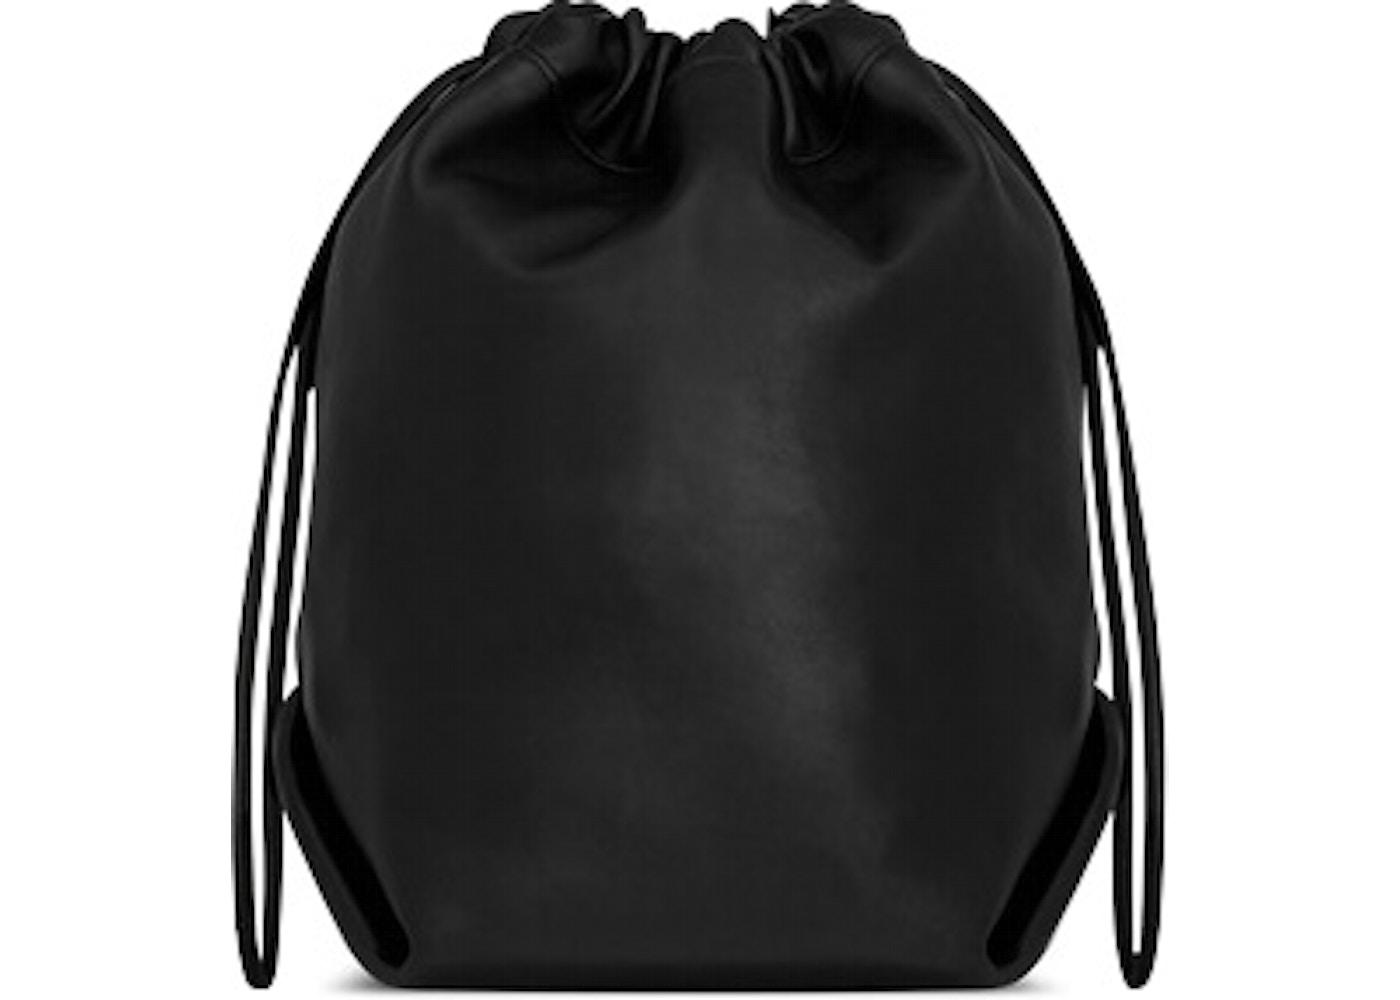 Saint Laurent Teddy Drawstring Bag Smooth Leather Black 9f9169272cec0